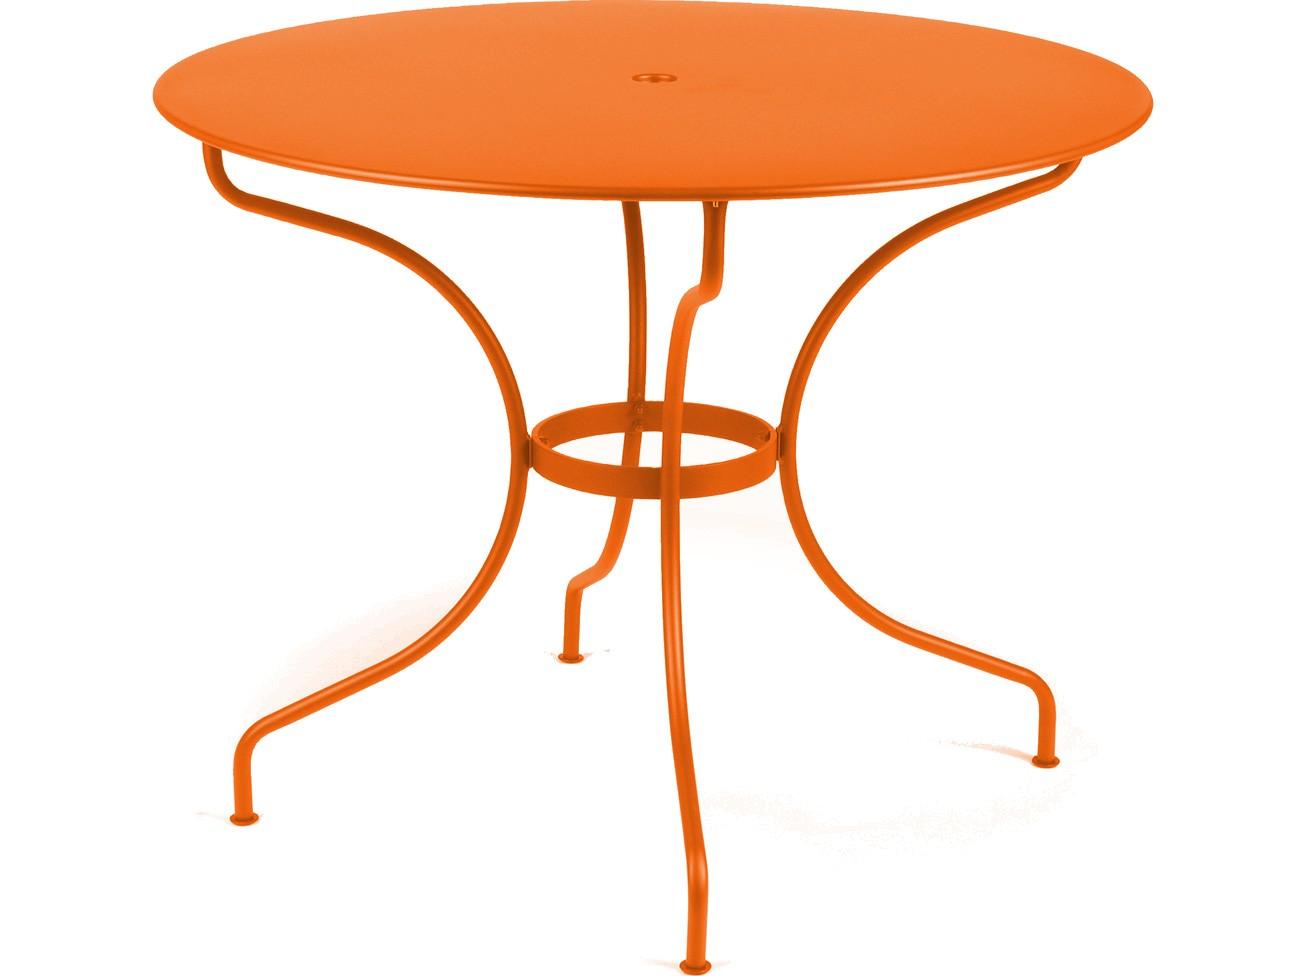 Table ronde op ra de fermob carotte - Fermob opera table ...